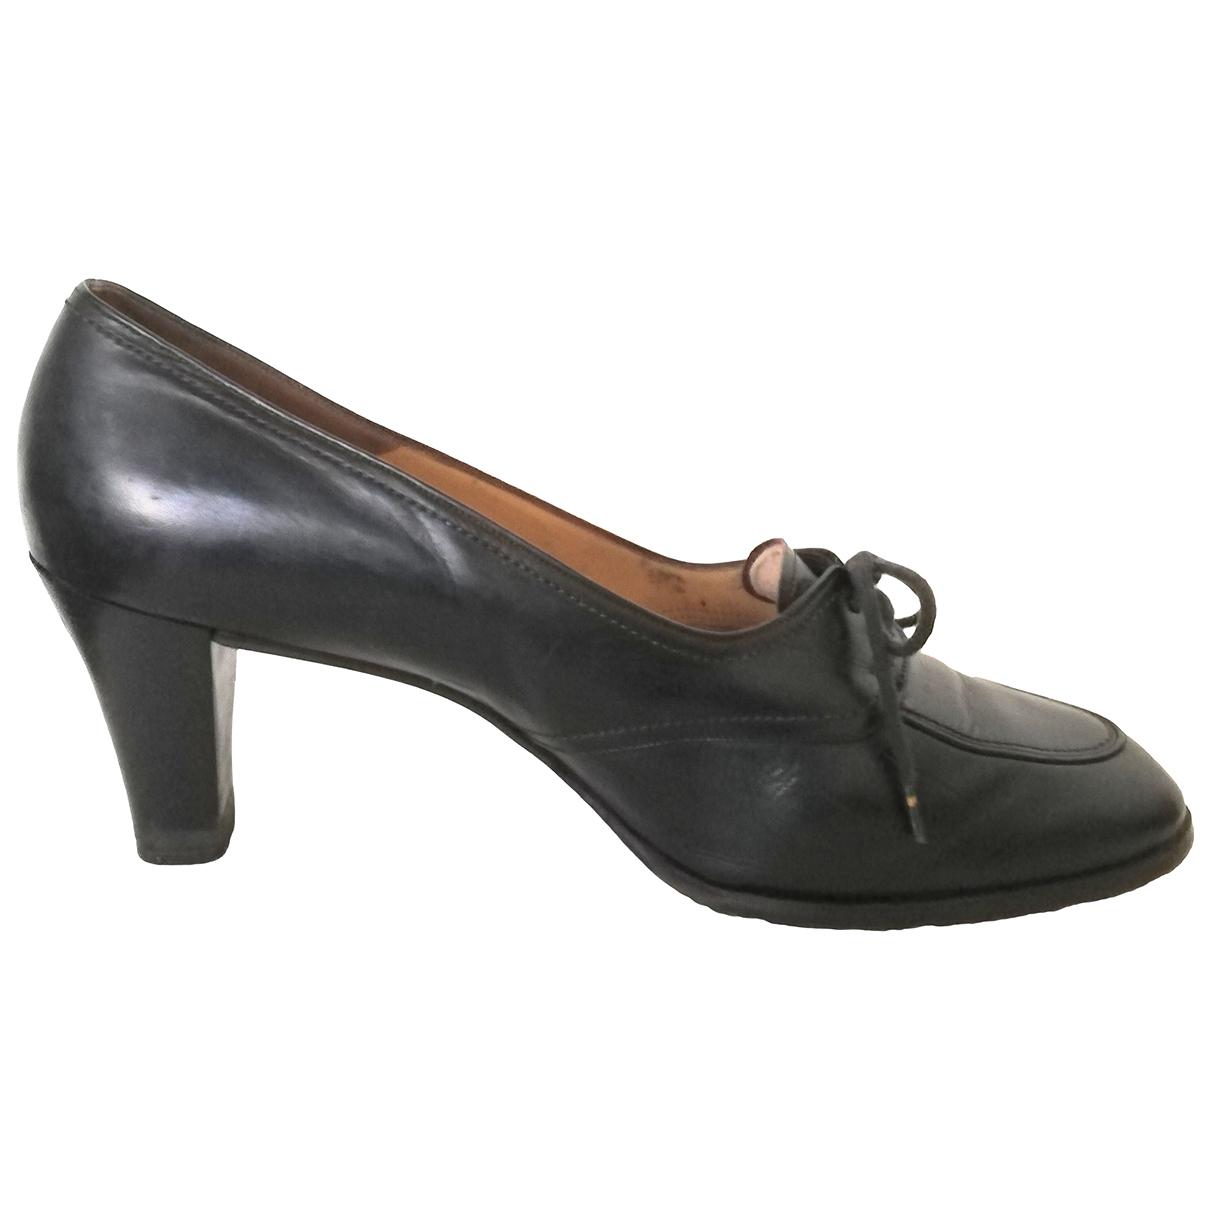 Bally N Black Leather Heels for Women 6.5 UK